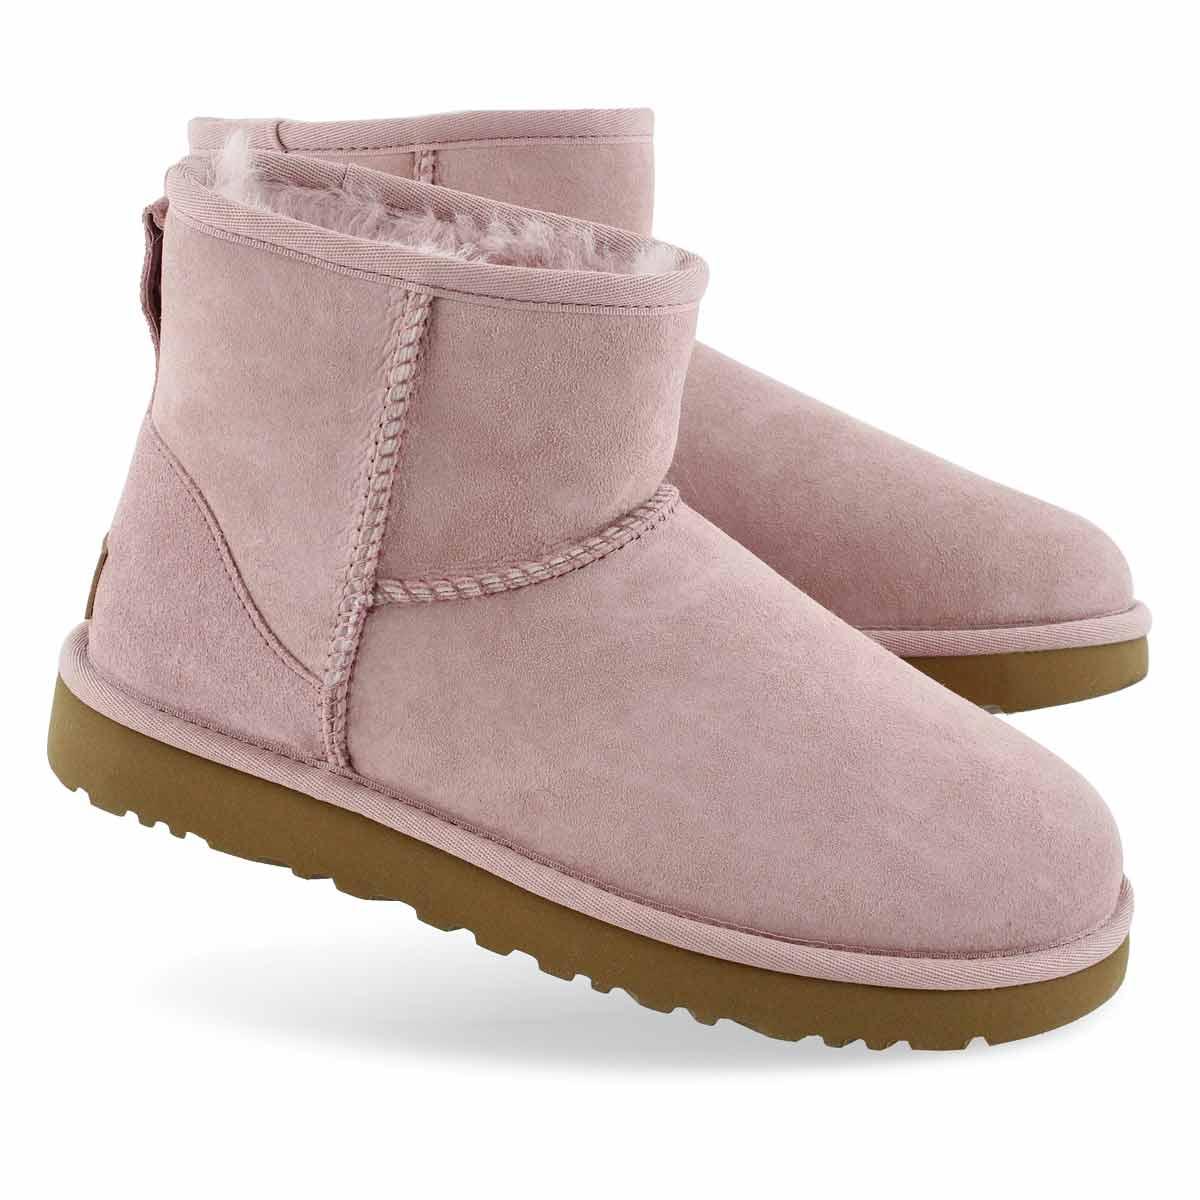 Women's CLASSIC MINI II pink crystal boots